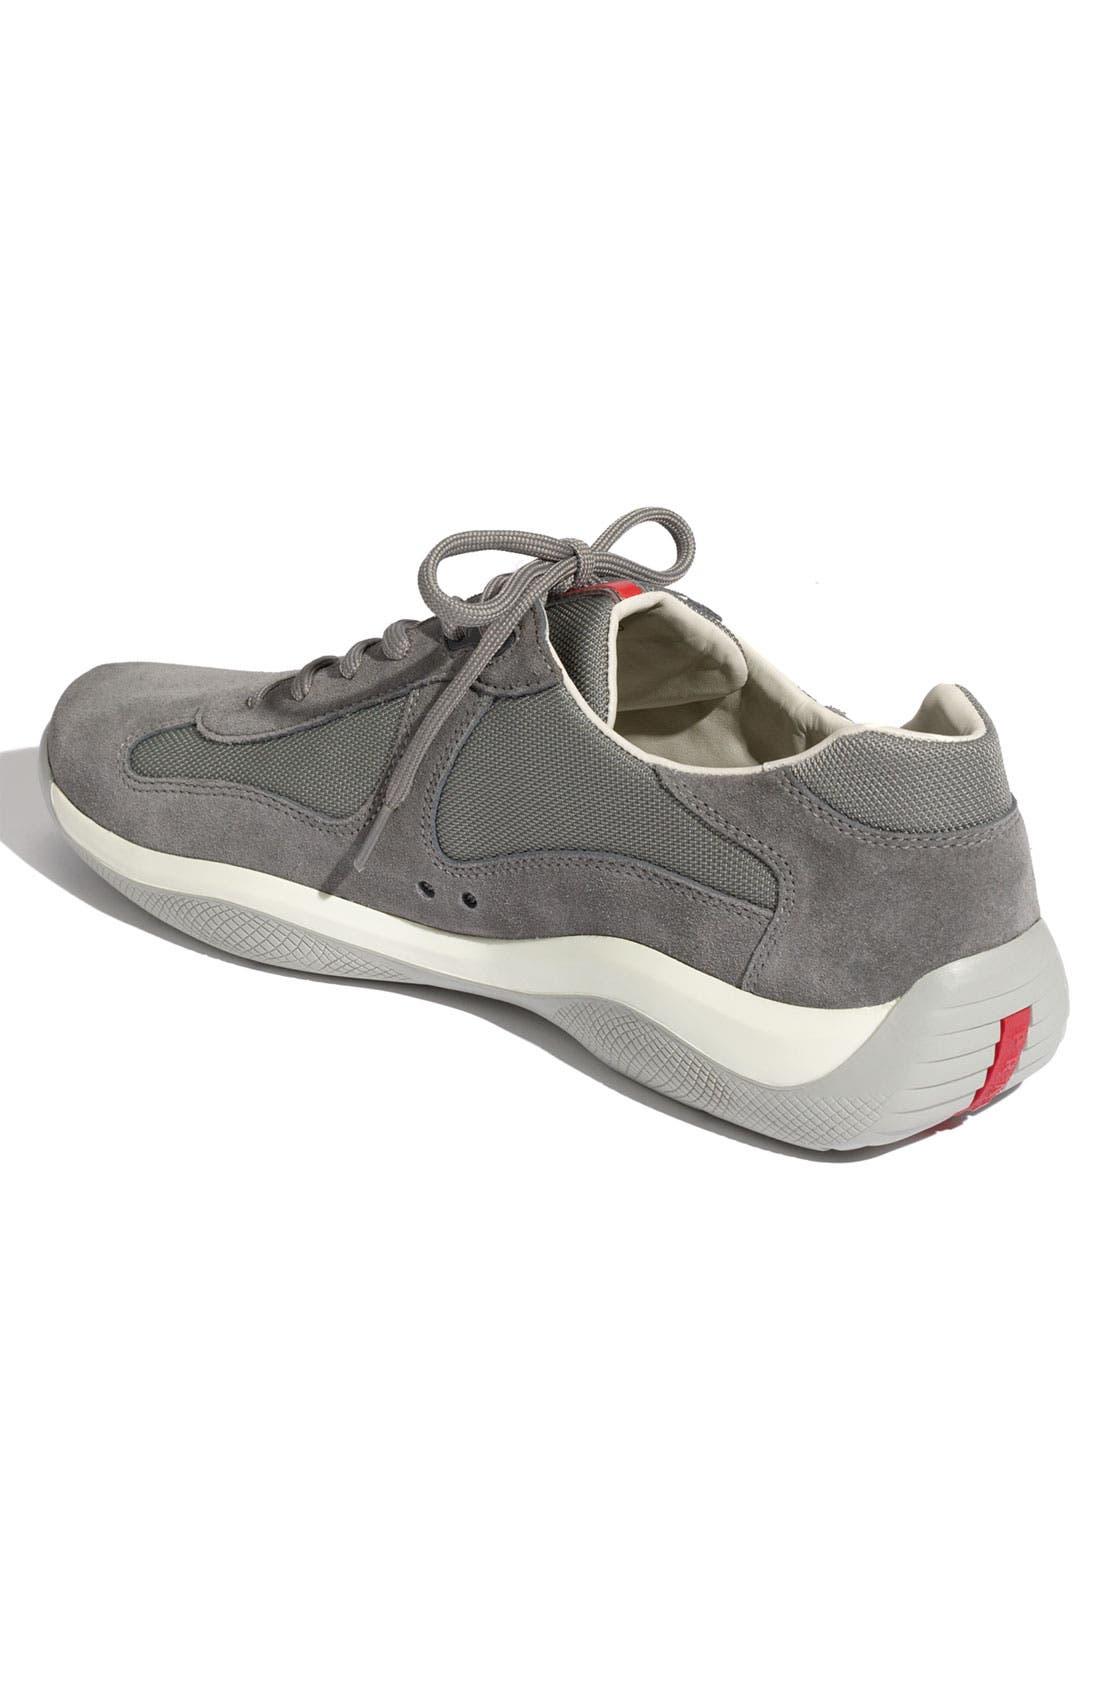 Alternate Image 2  - Prada 'Punta Ala' Suede Sneaker (Men)